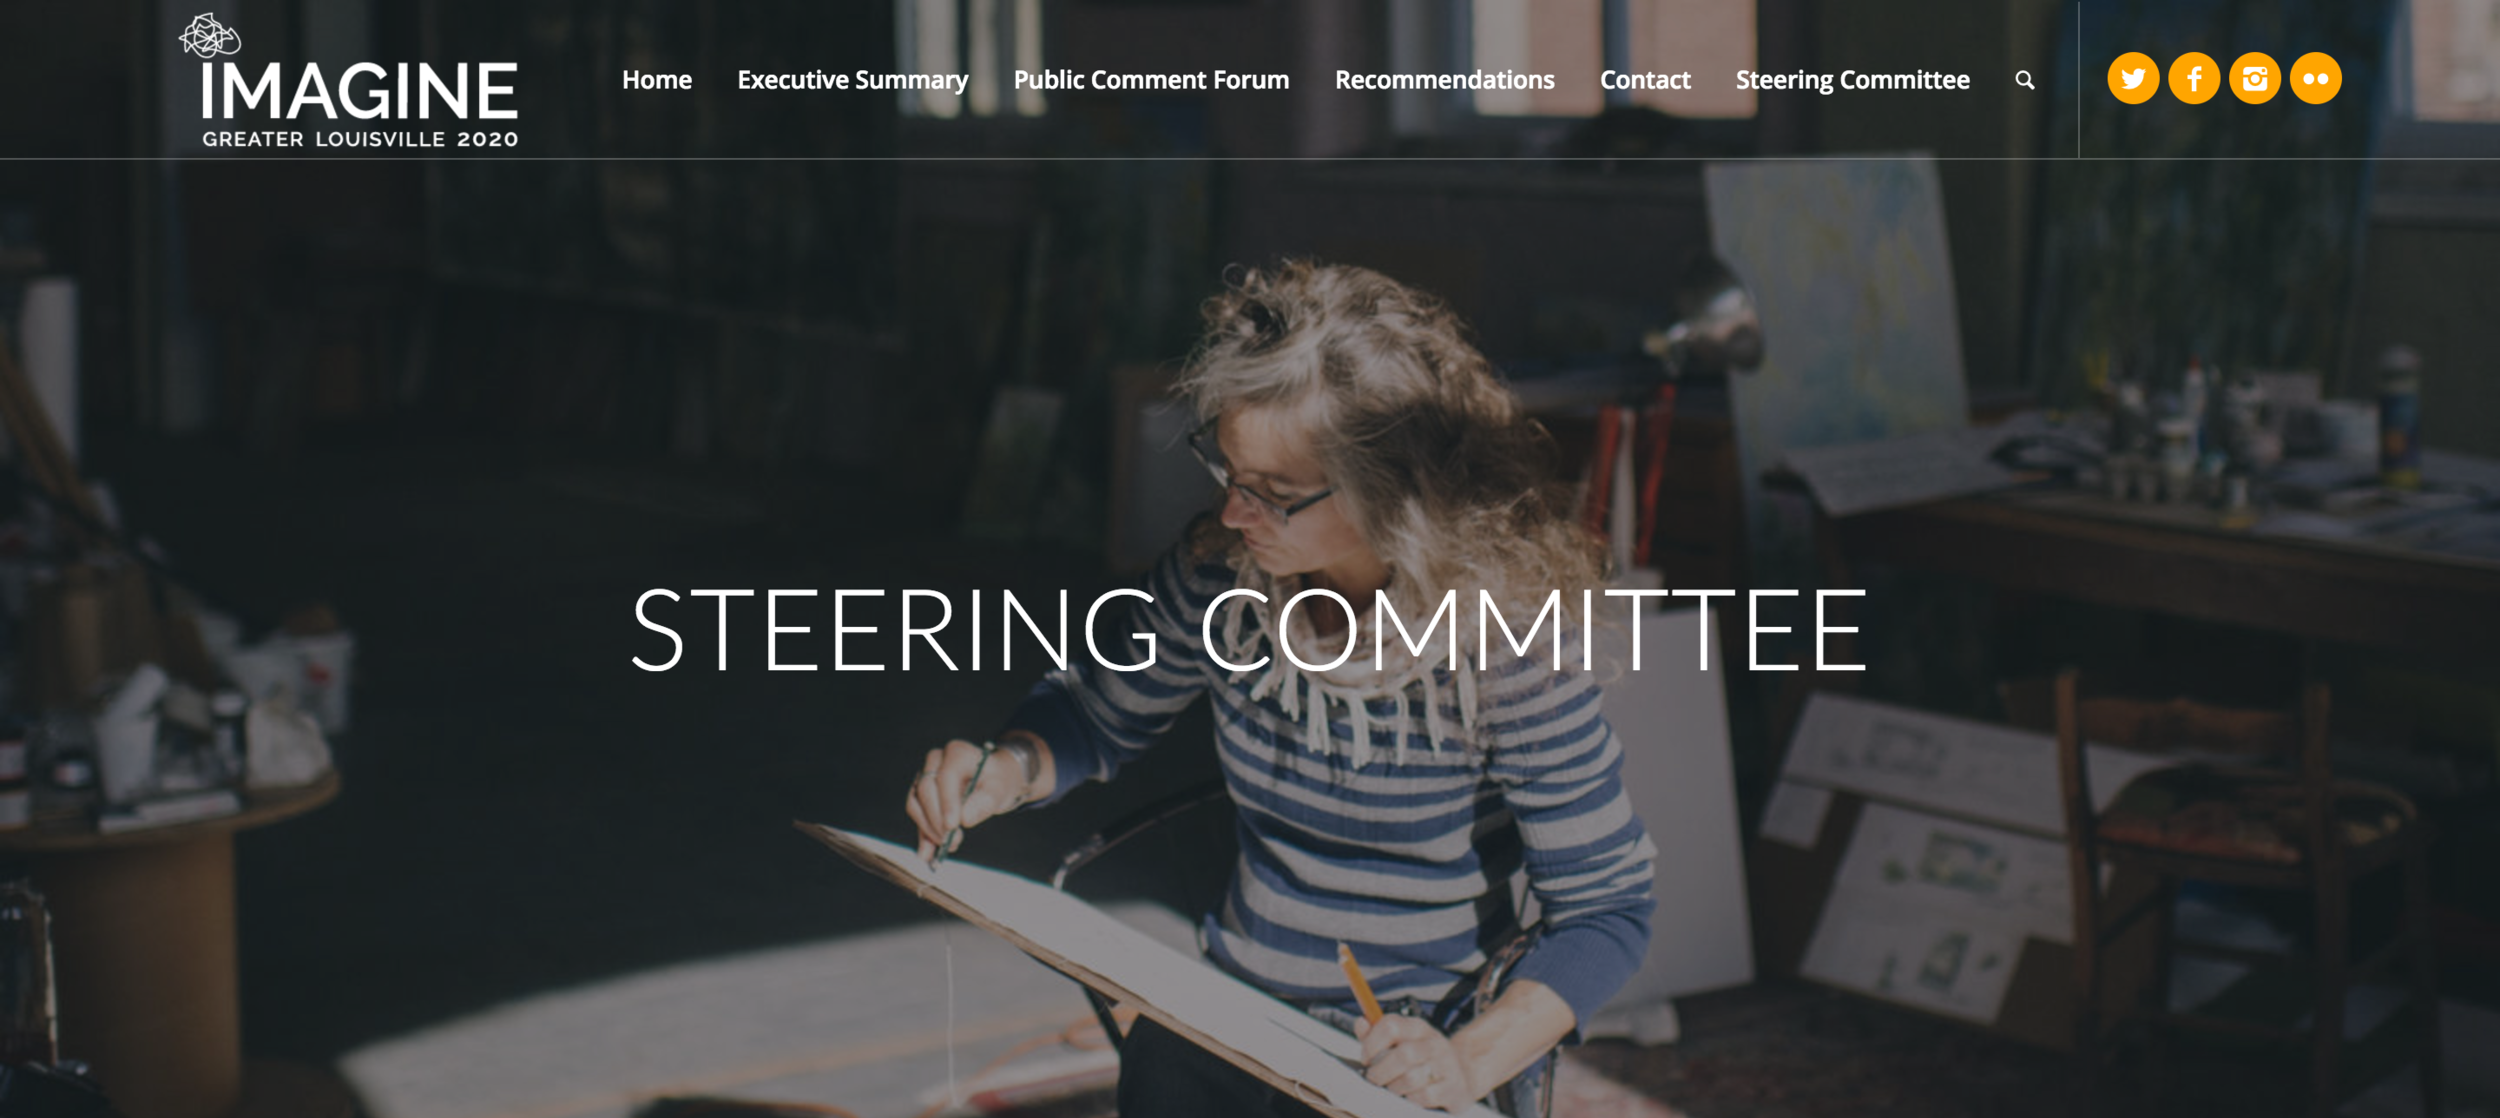 Steering Committee – Imagine Greater Louisville 2020.png